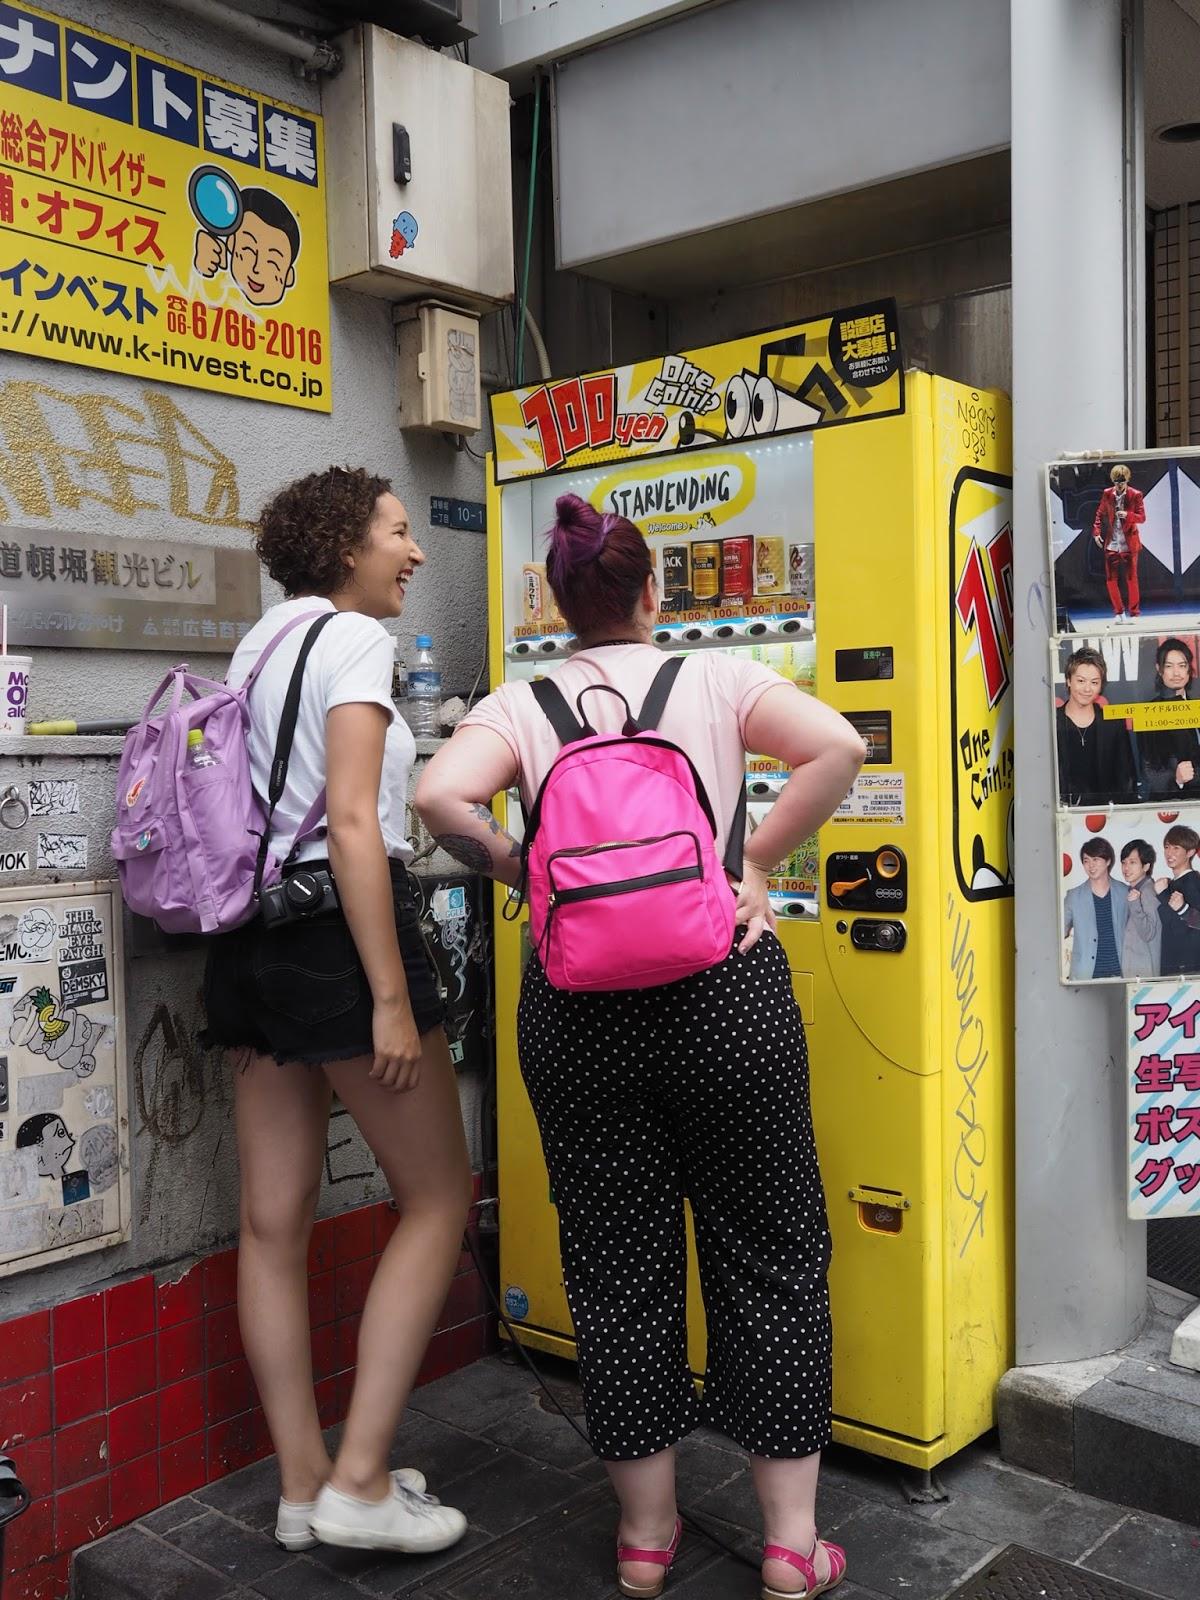 Using vending machines in Japan